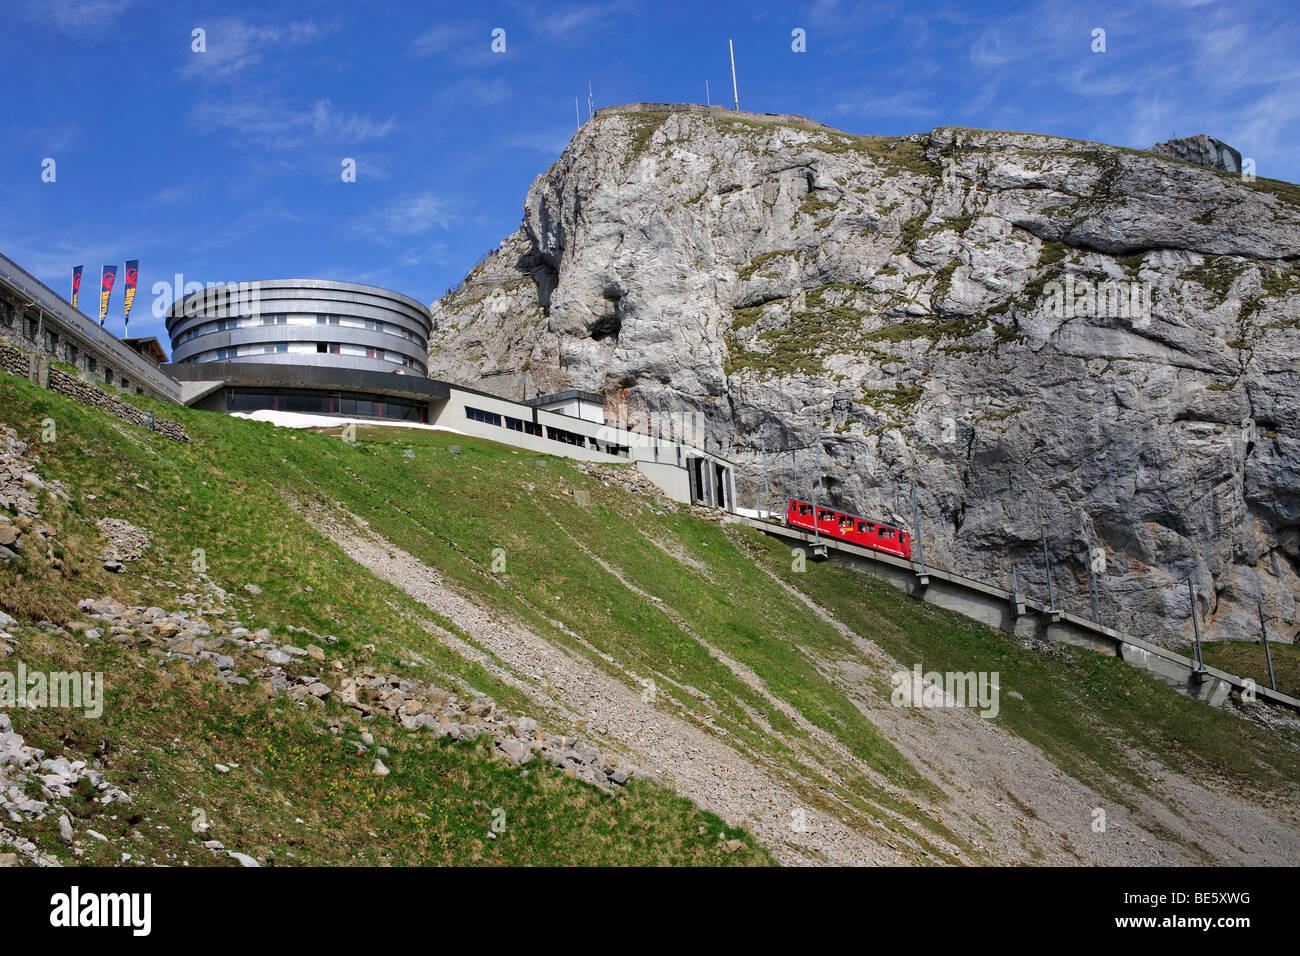 Hotel Bellevue on Mount Pilatus, popular tourist's destination, near Lucerne, Switzerland, Europe - Stock Image